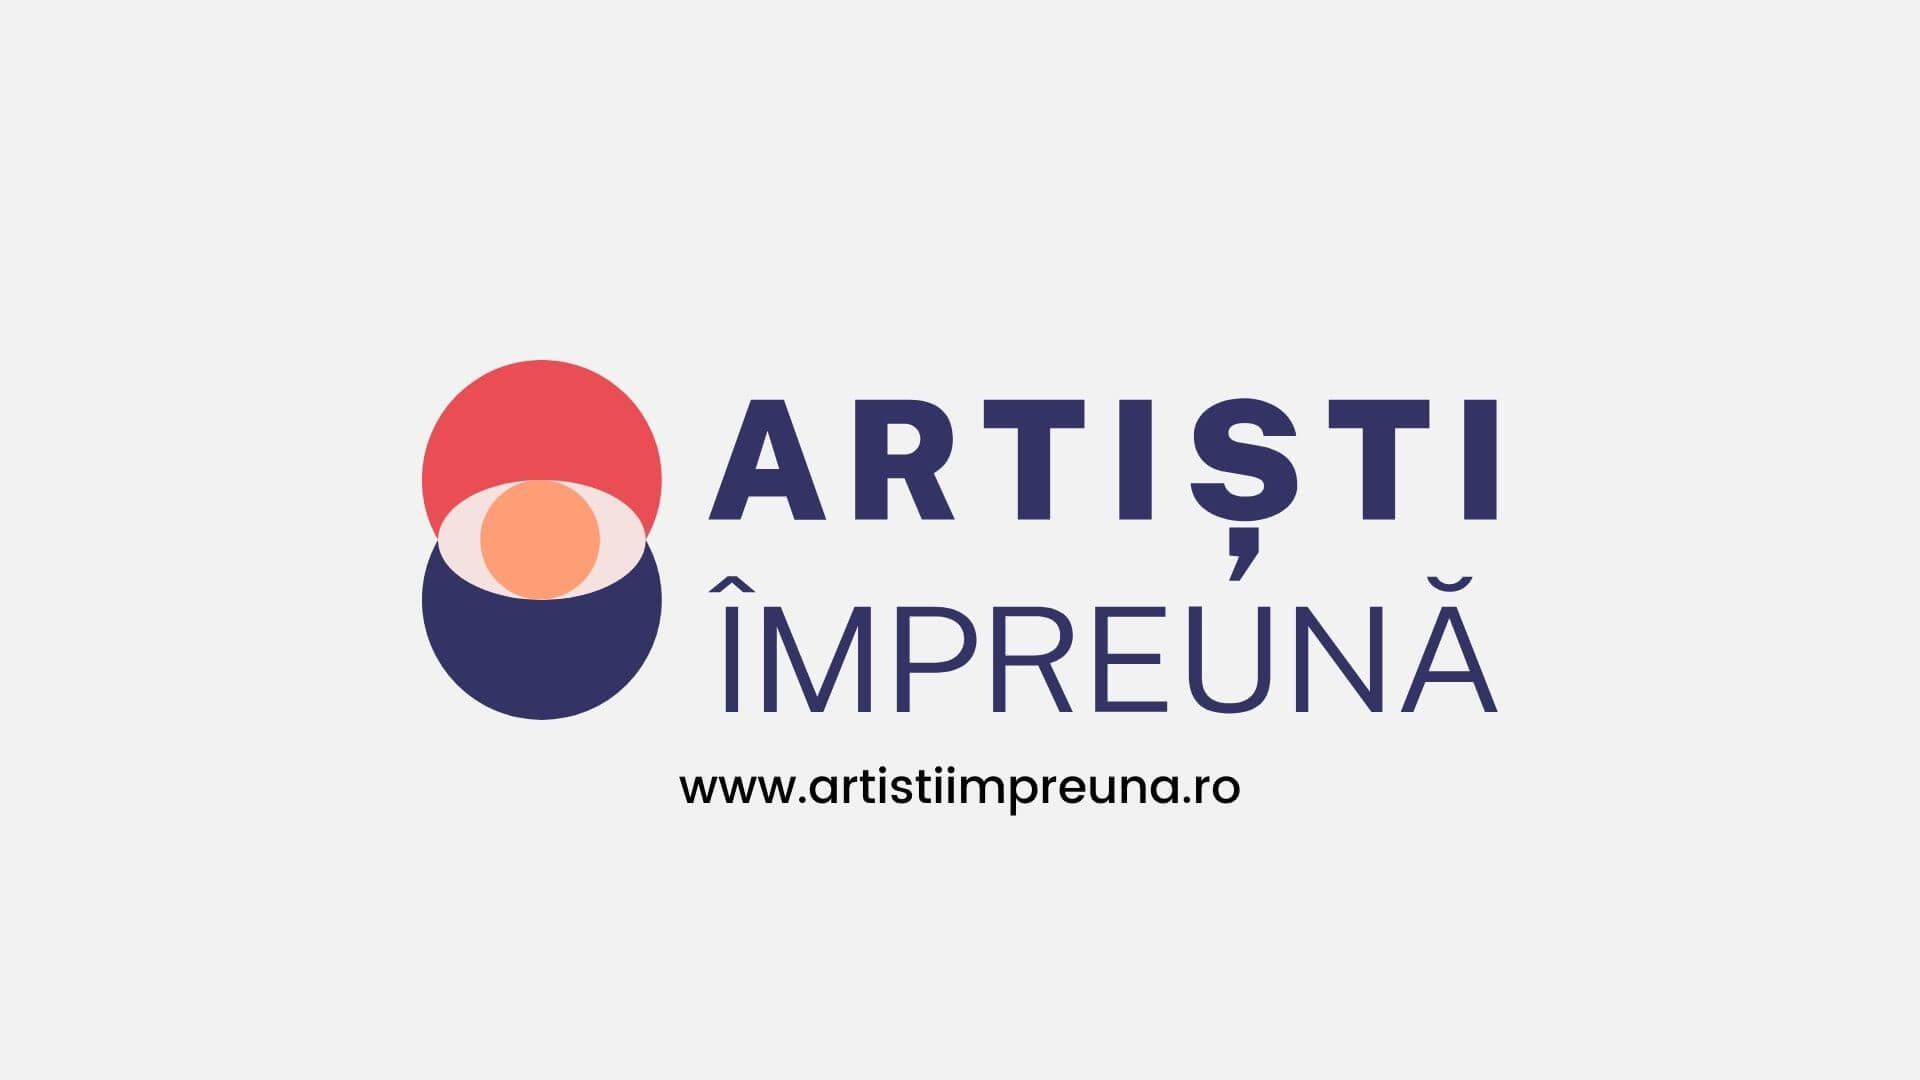 www.artistiimpreuna.ro